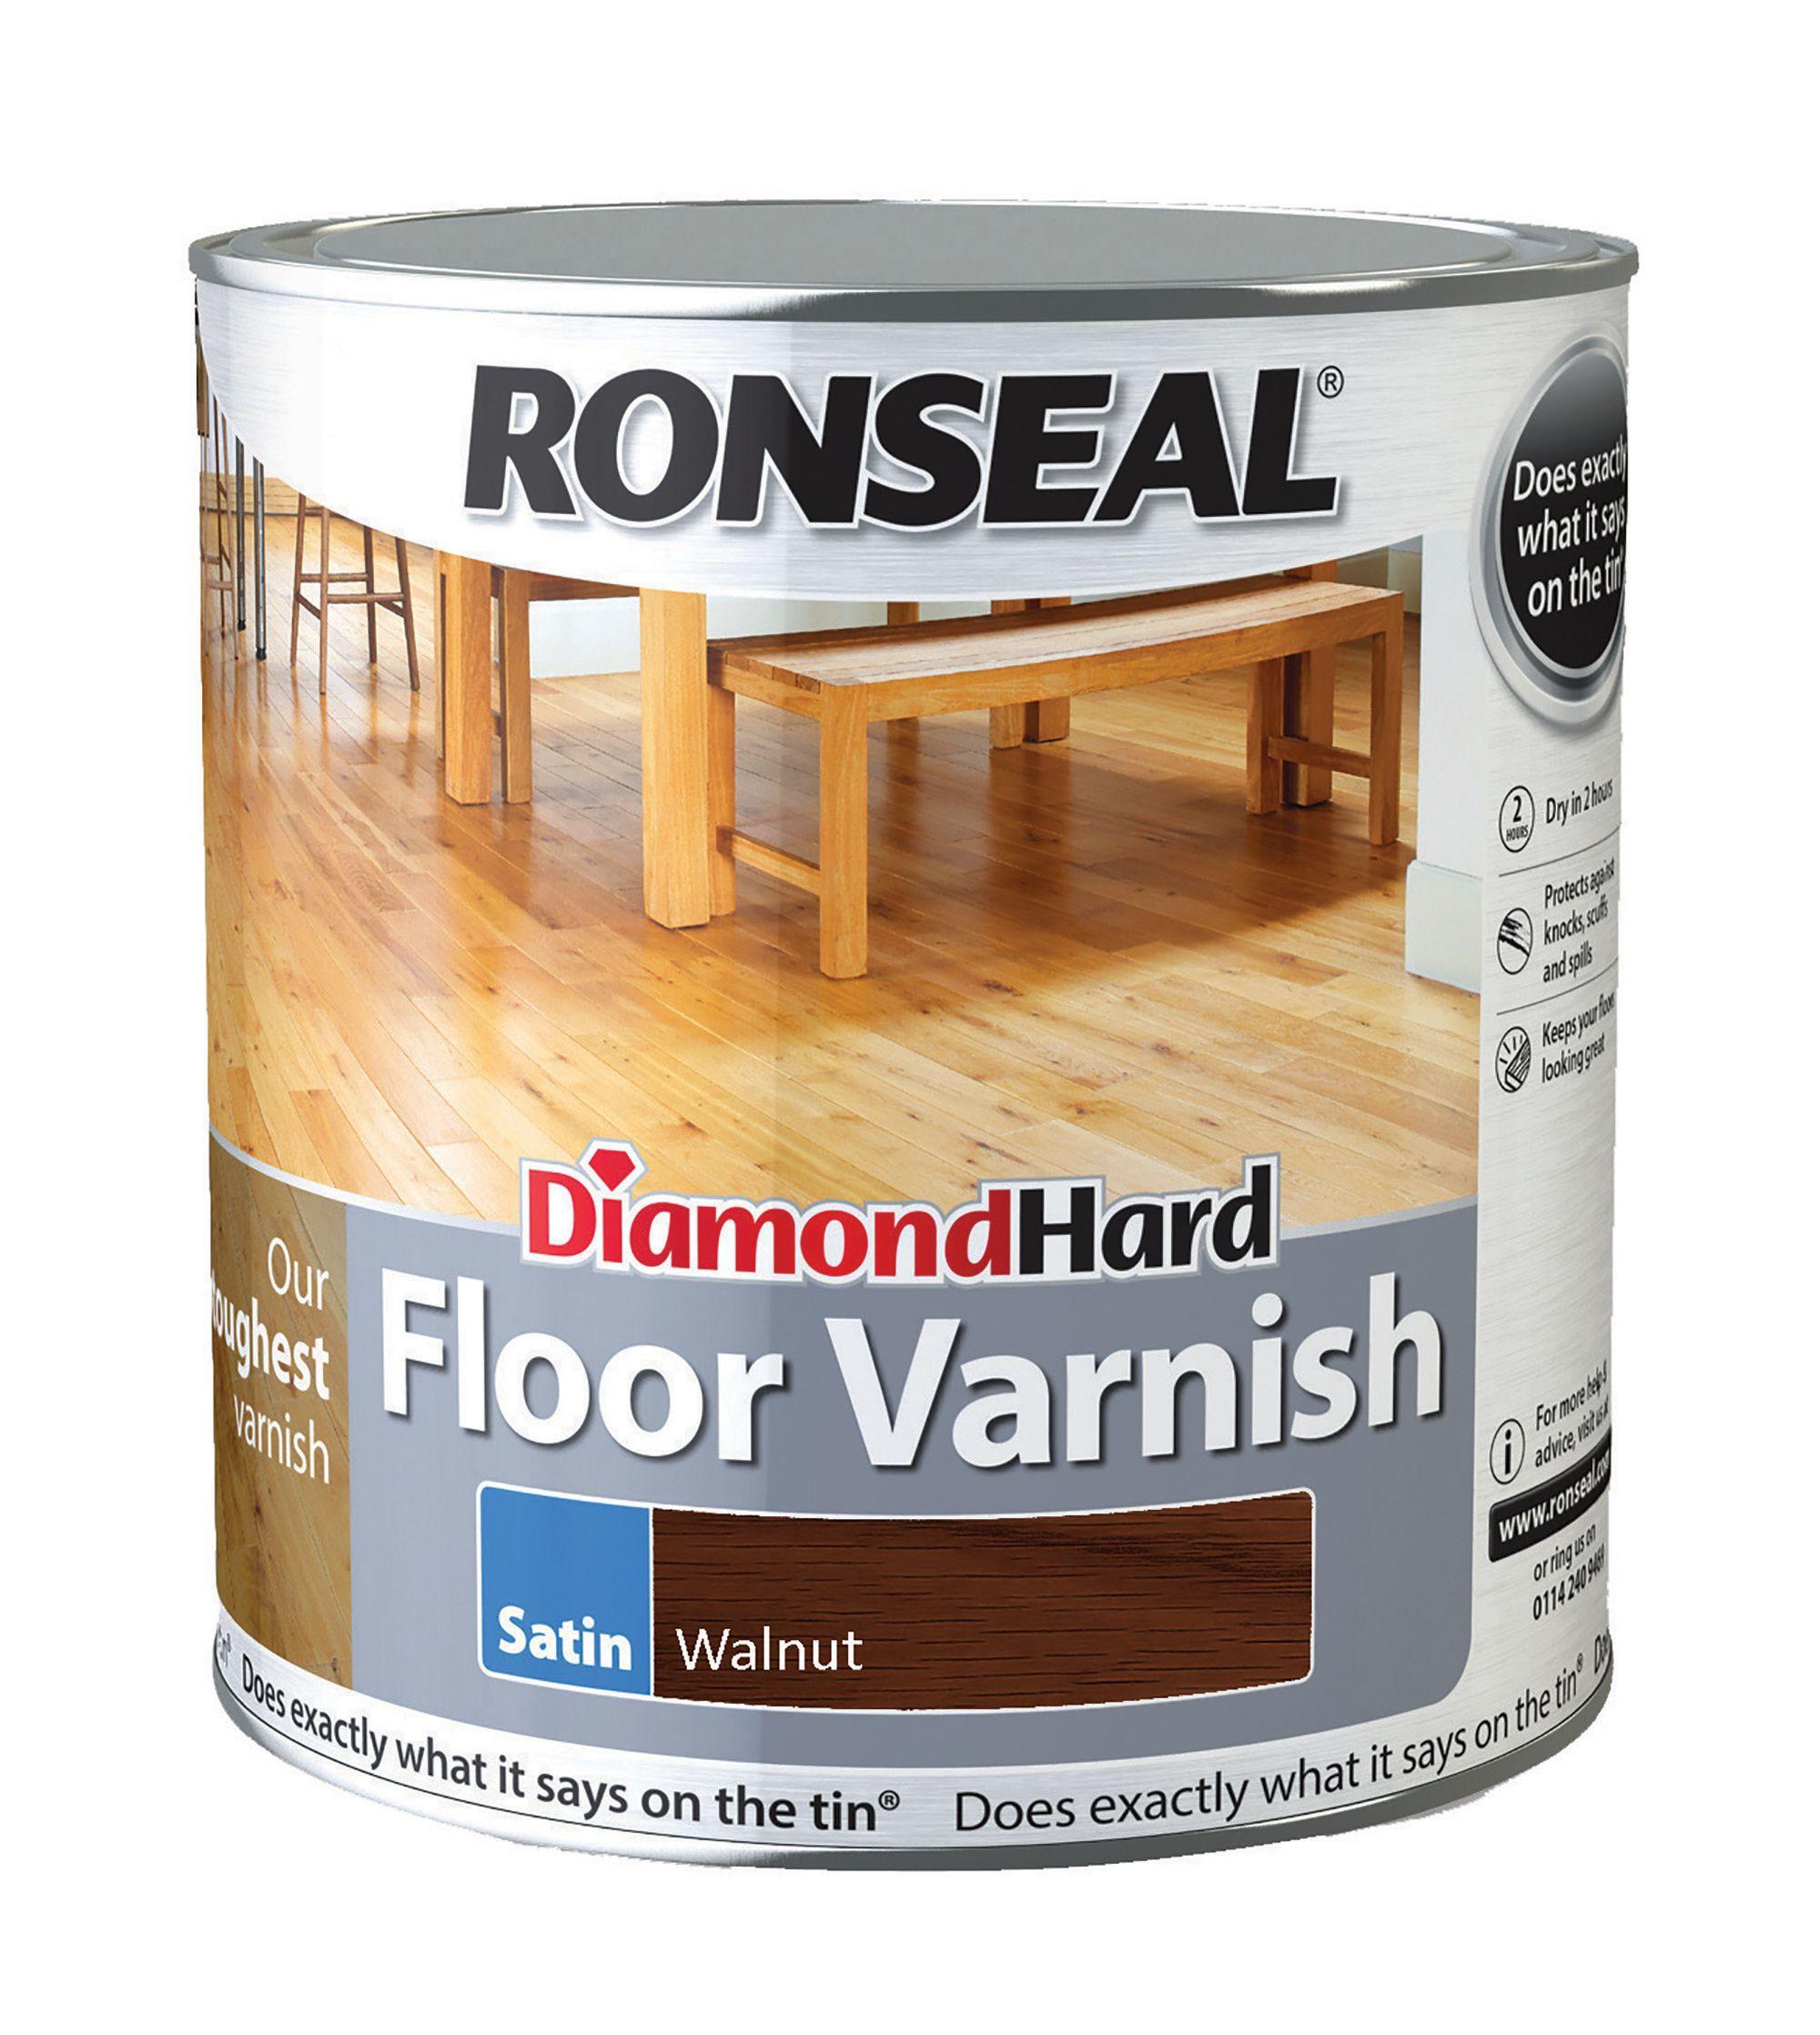 Ronseal Diamond Hard Walnut Satin Floor Varnish 2.5l